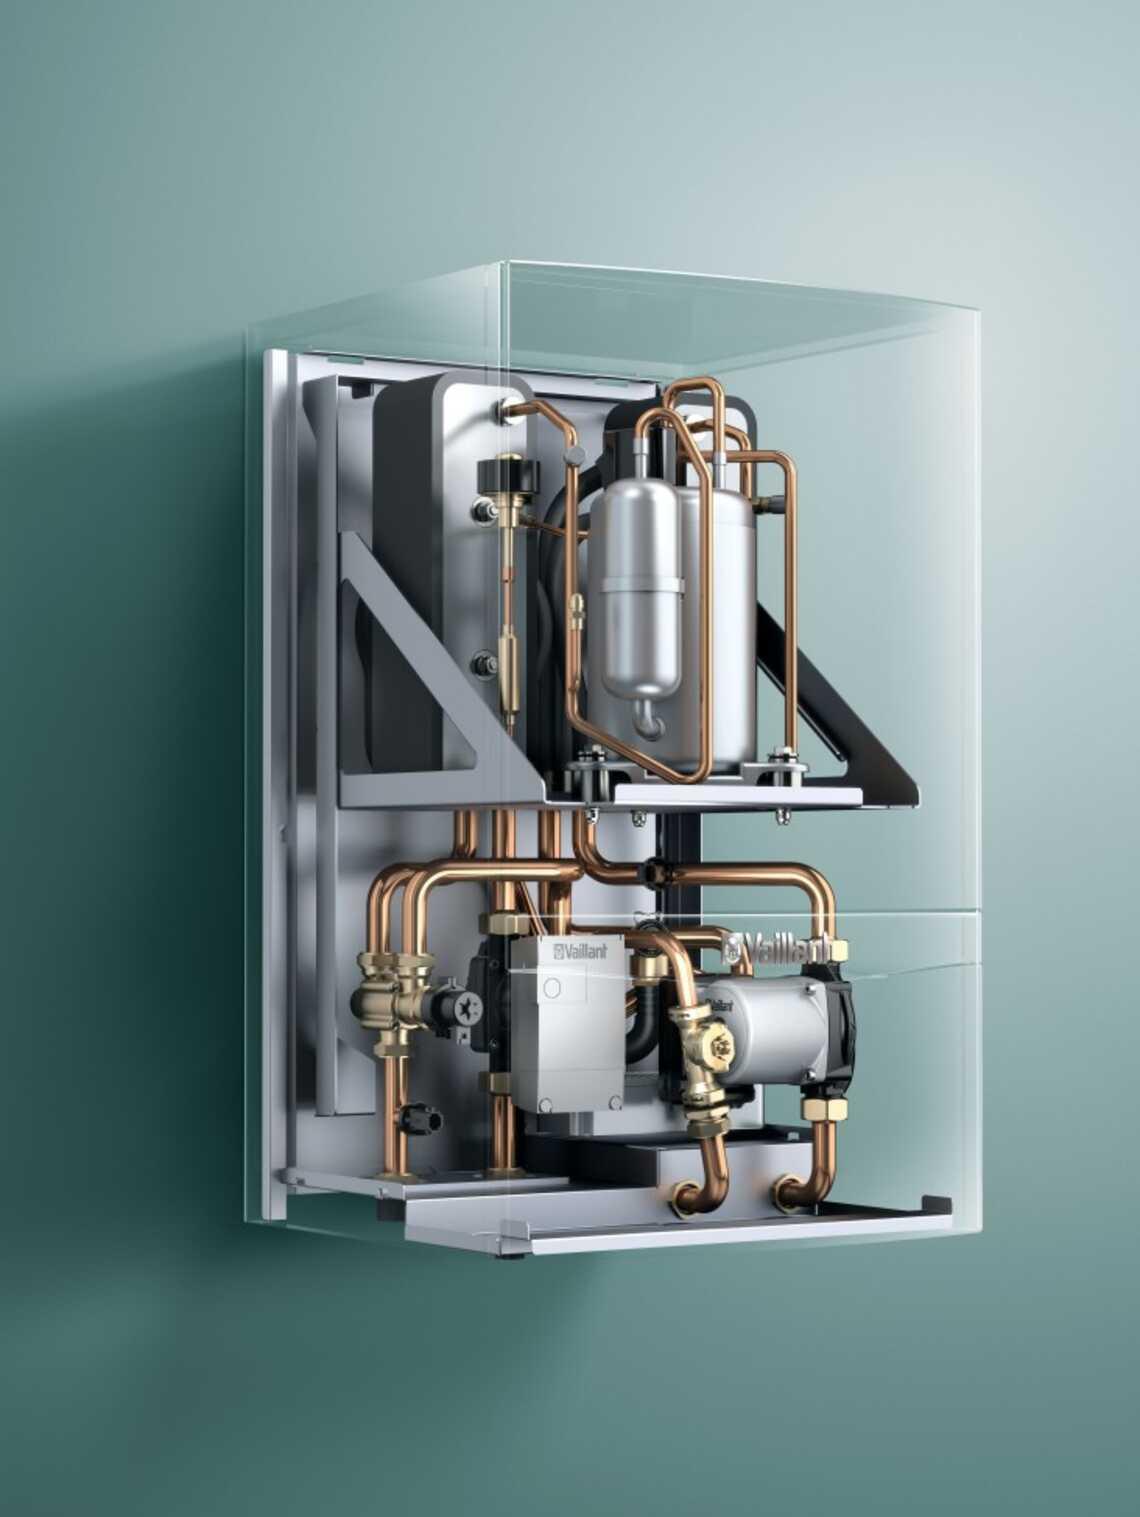 pompe chaleur sol eau murale hybride geotherm hybride vws 36 vaillant. Black Bedroom Furniture Sets. Home Design Ideas